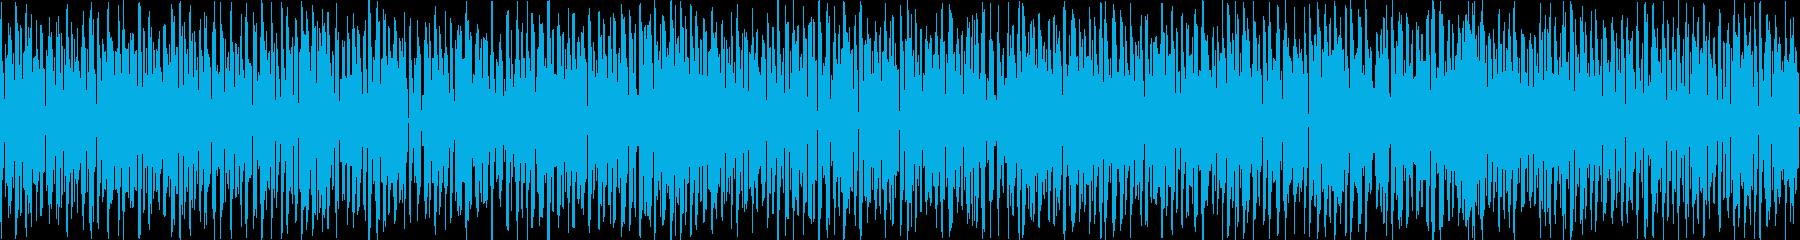 8bit風チューン(ワクワク)ループ用の再生済みの波形